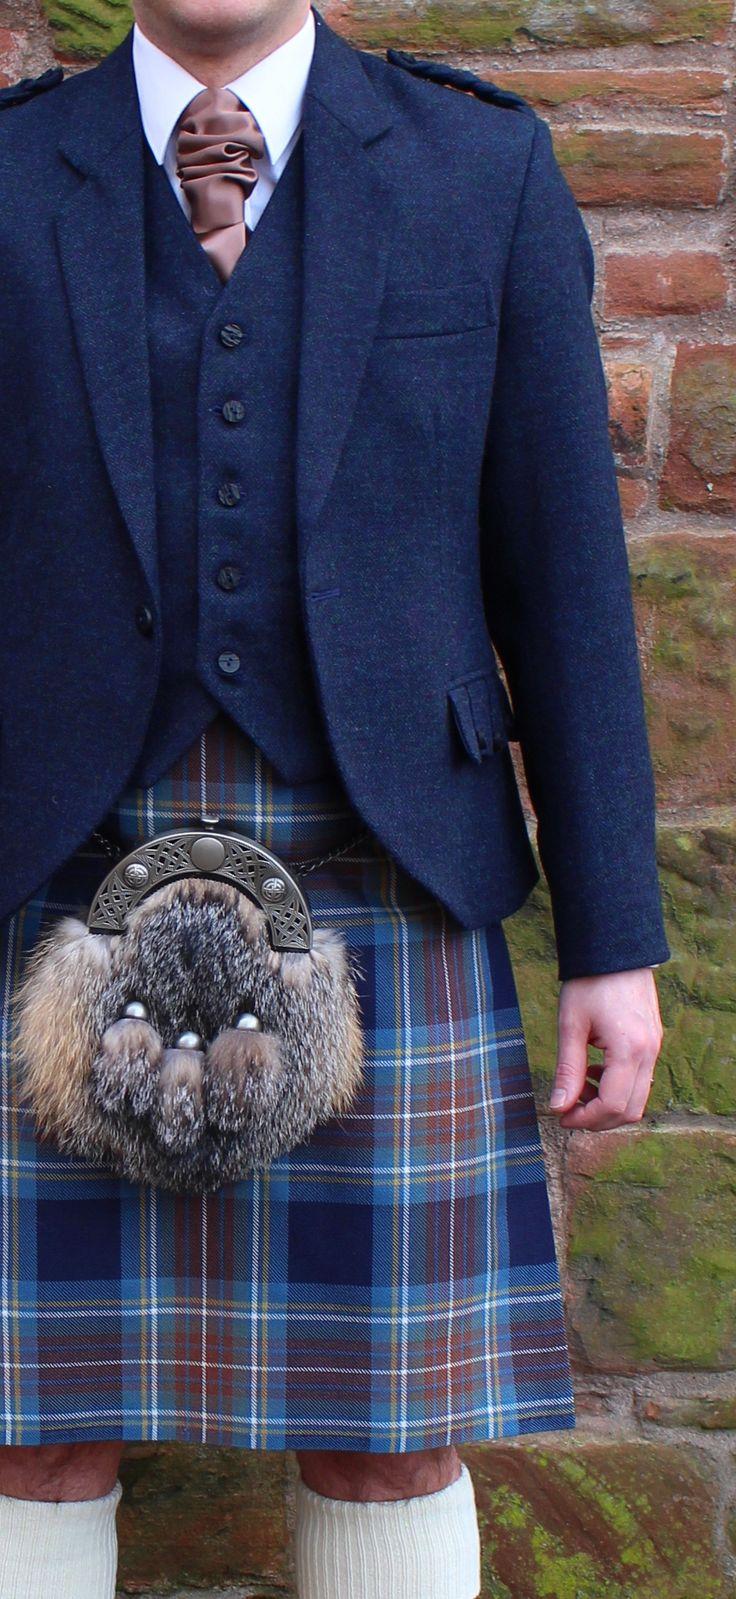 Holyrood tartan with midnight blue tweed jacket & vest and grey fox sporran